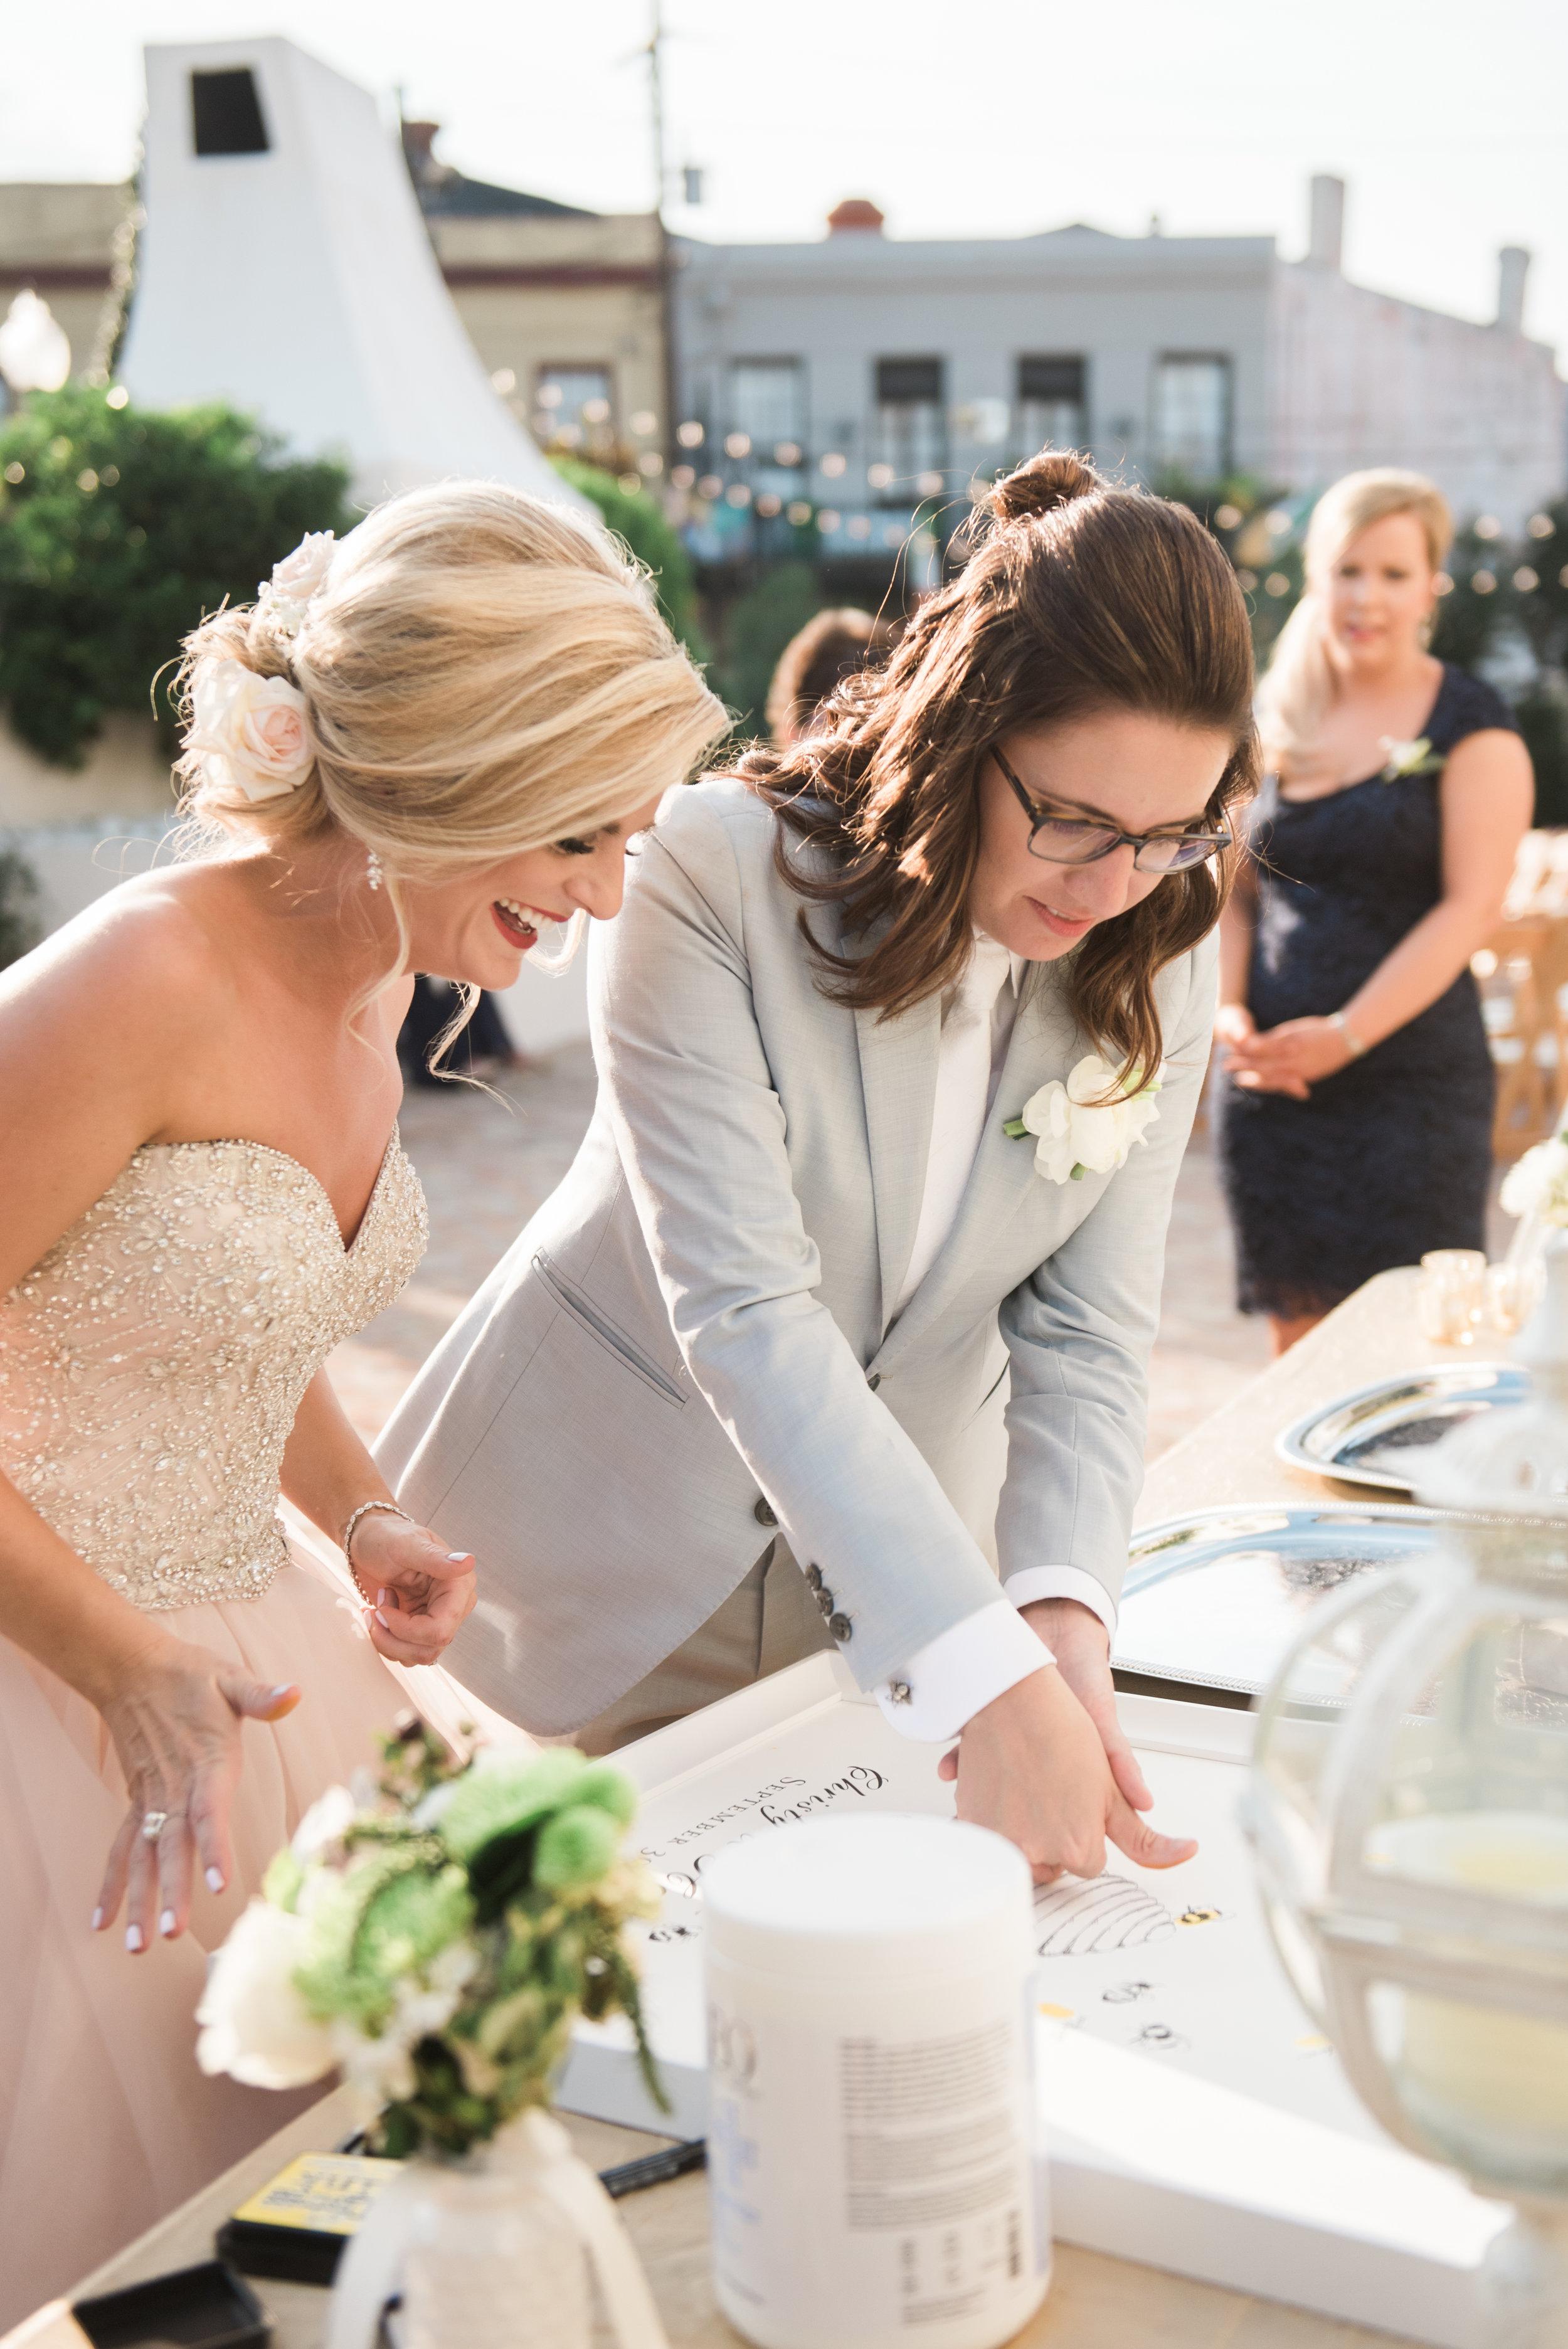 Il Mercato Wedding Planning 137.jpg